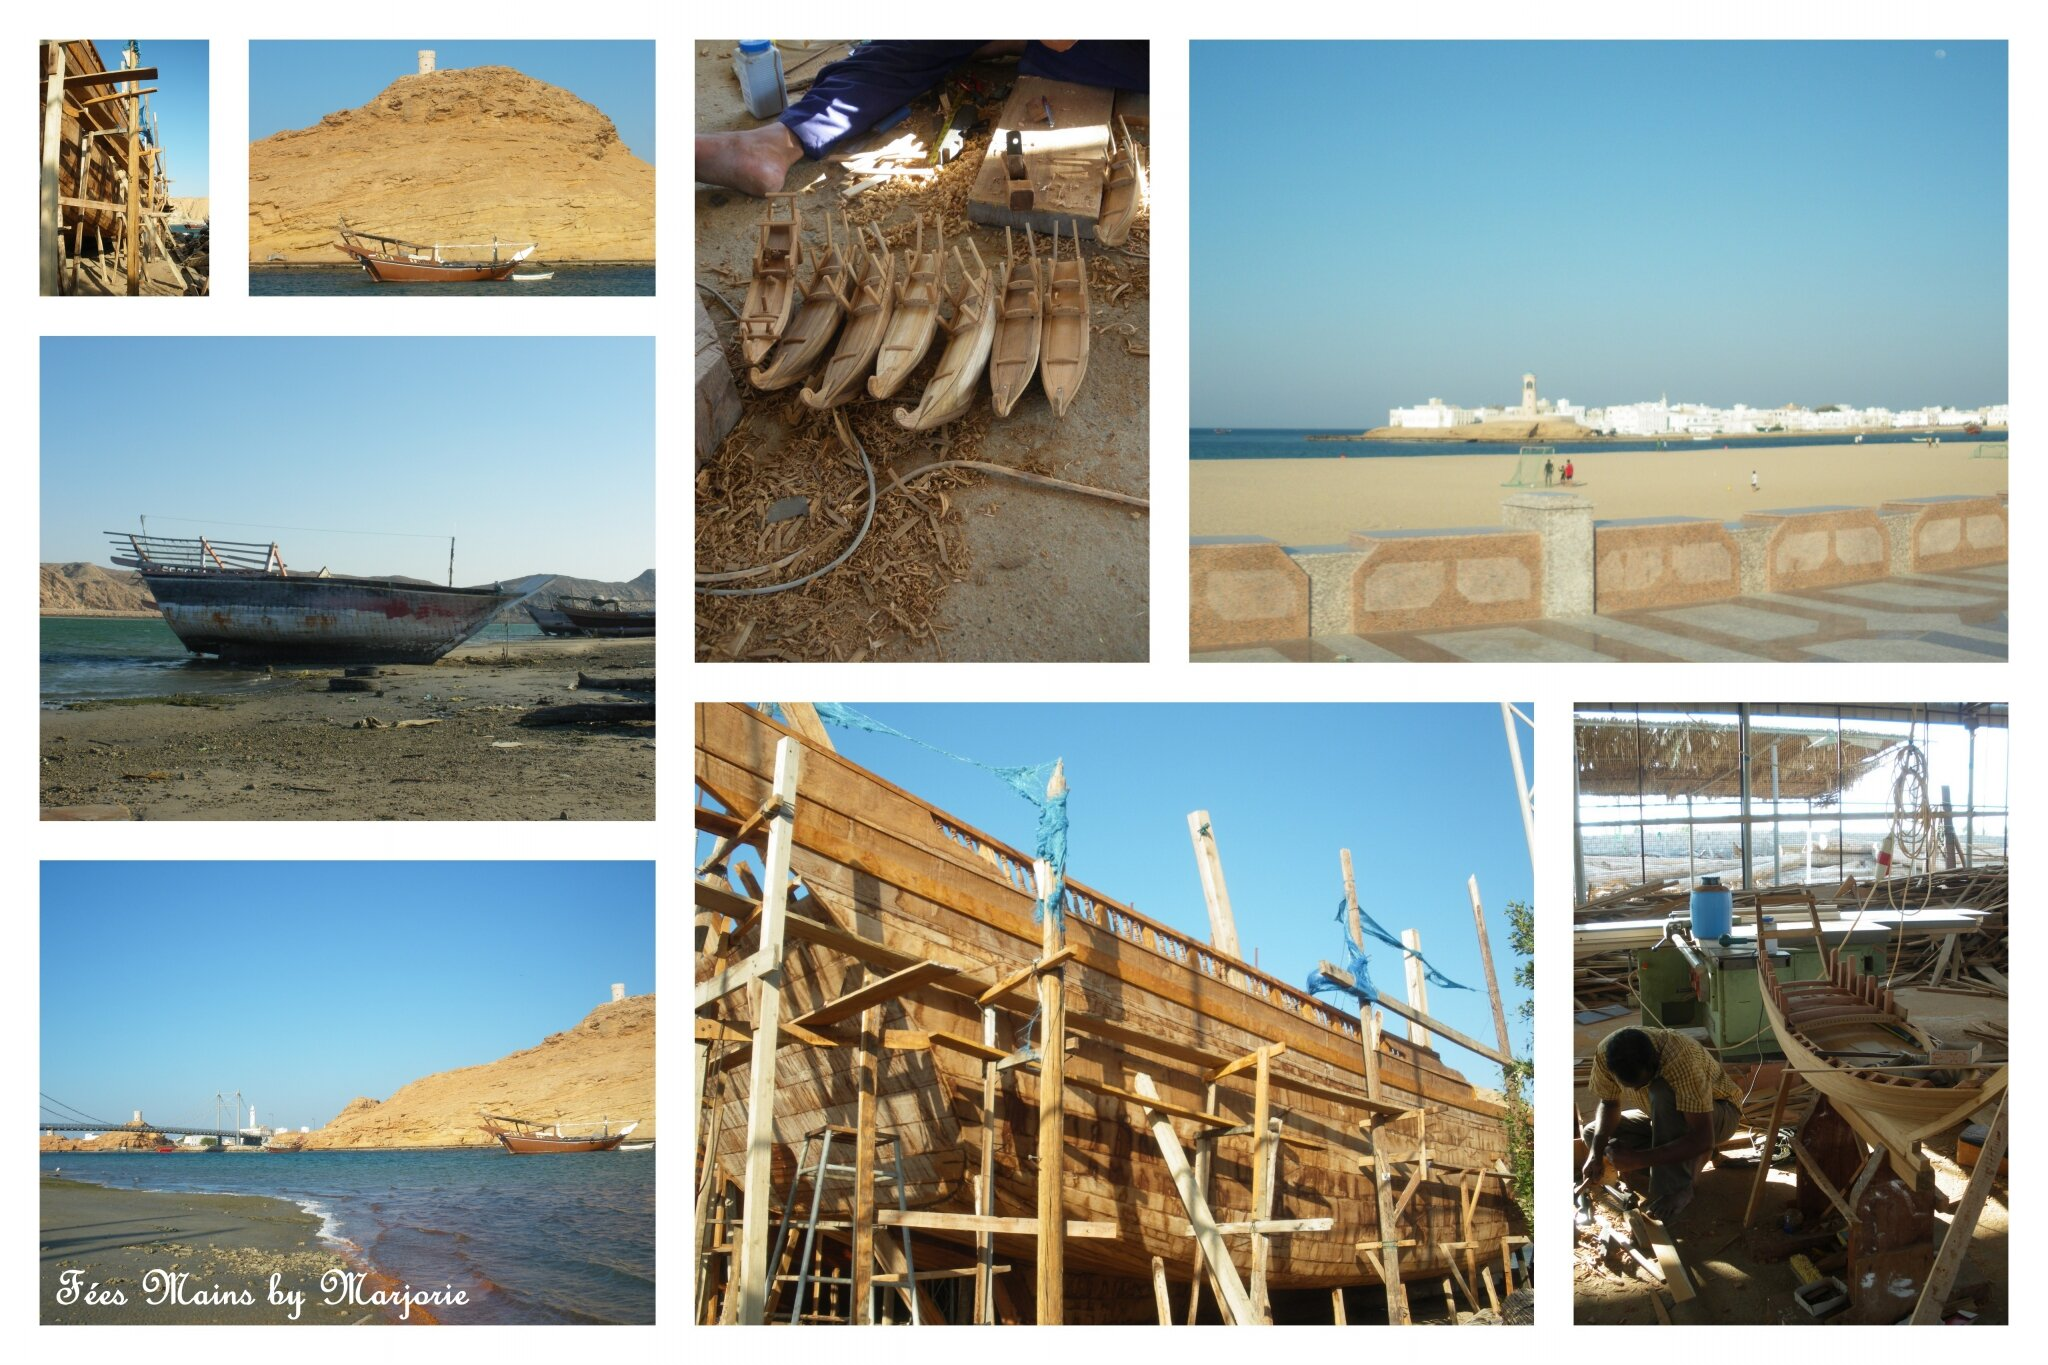 Sultanat d'Oman25